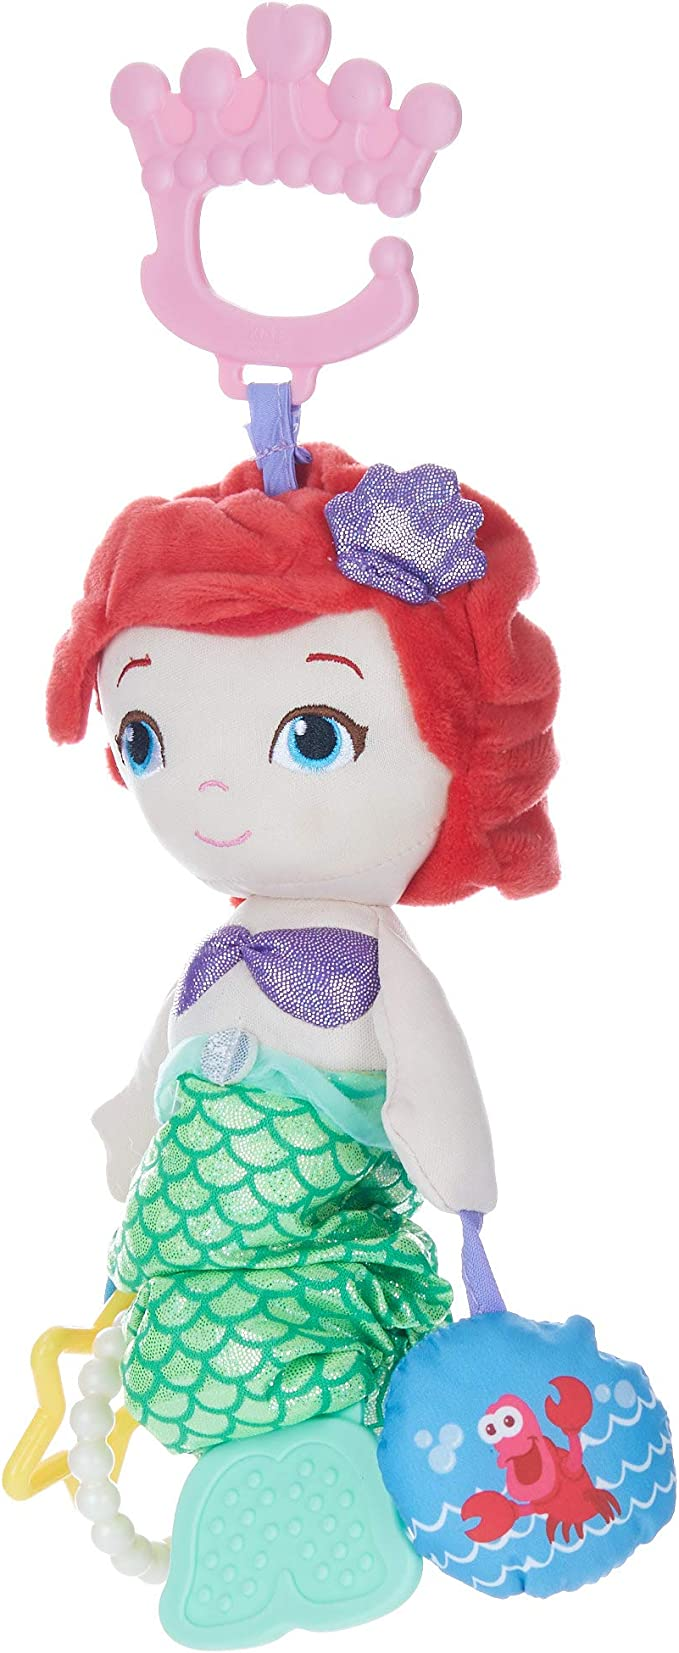 Disney On-The-Go Musical Toy Princess Plush Stick Rattle